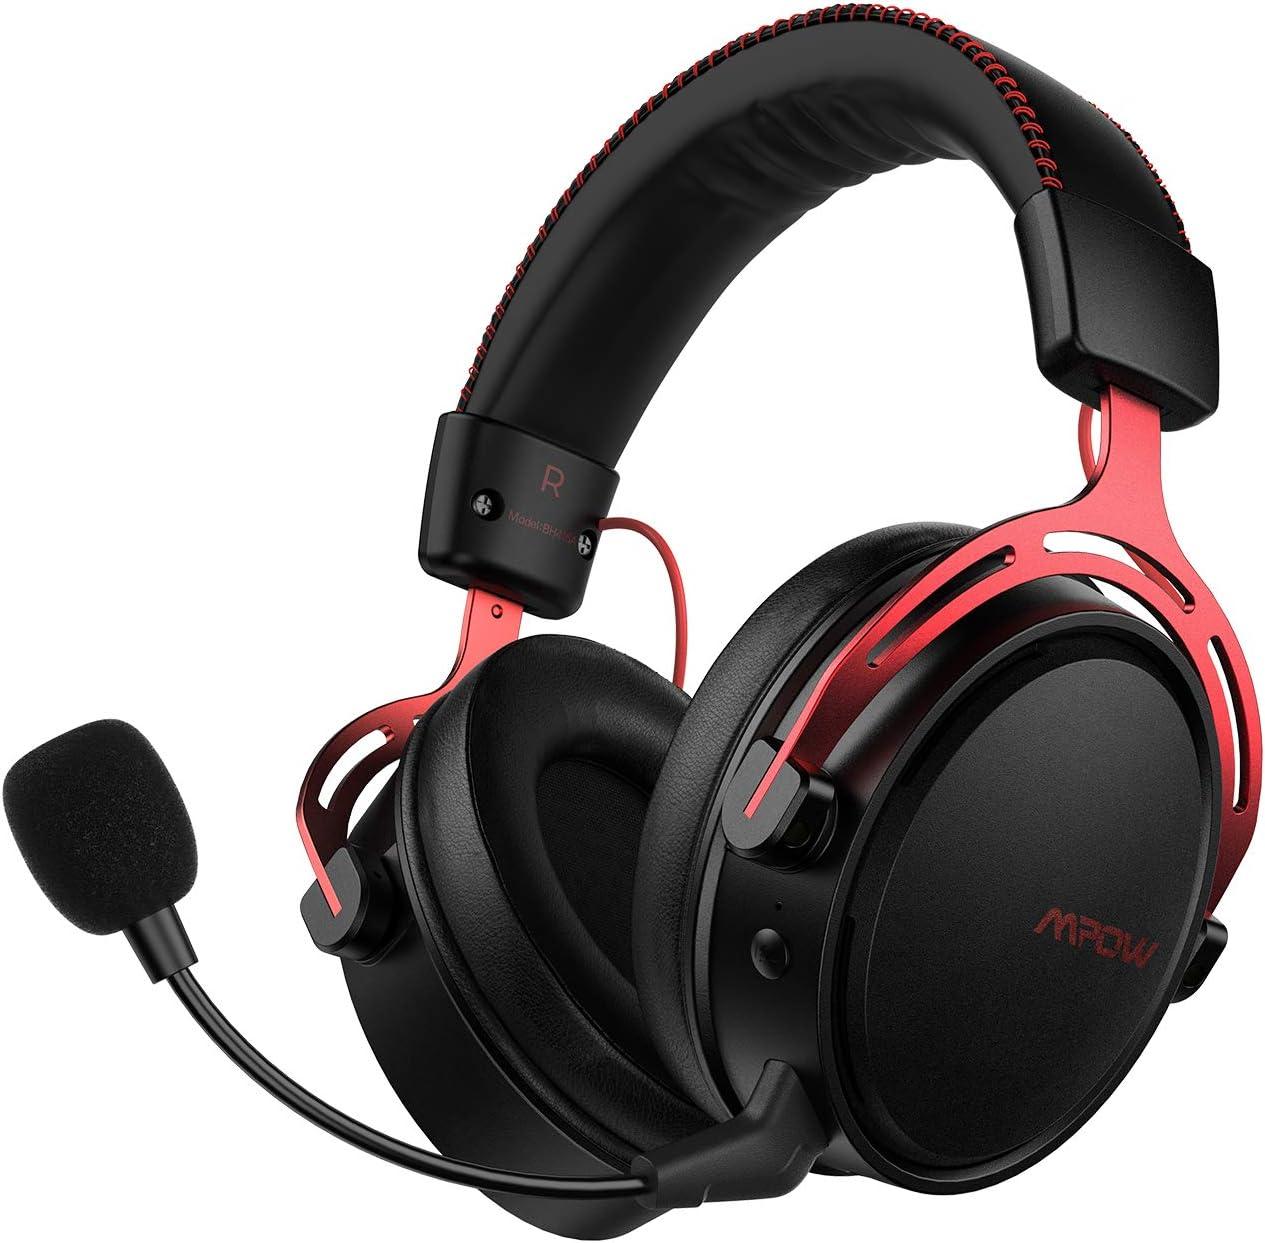 Mpow Auriculares Gaming para PS4, PC, Xbox One, Estéreo Cascos Inalámbricos para Juegos con Micrófono Desmontable con Cancelación de Ruido,Espuma de Memoria, Sonido Envolvente, Transmisor USB Incluido